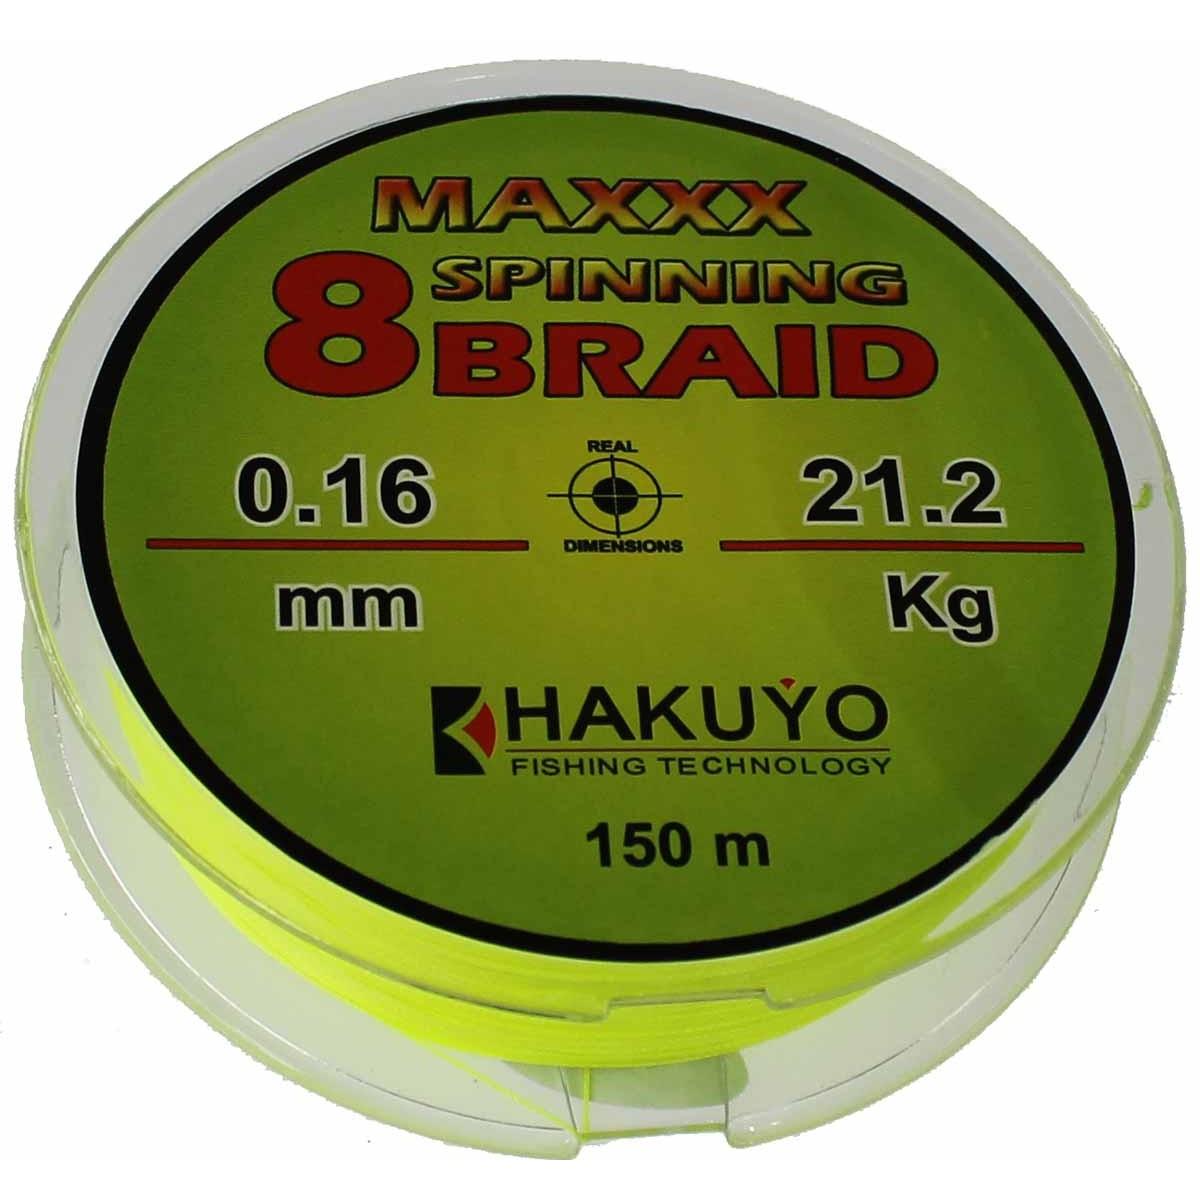 Hakuyo Maxxx Spinning 8 Braid 150m-плетеняк